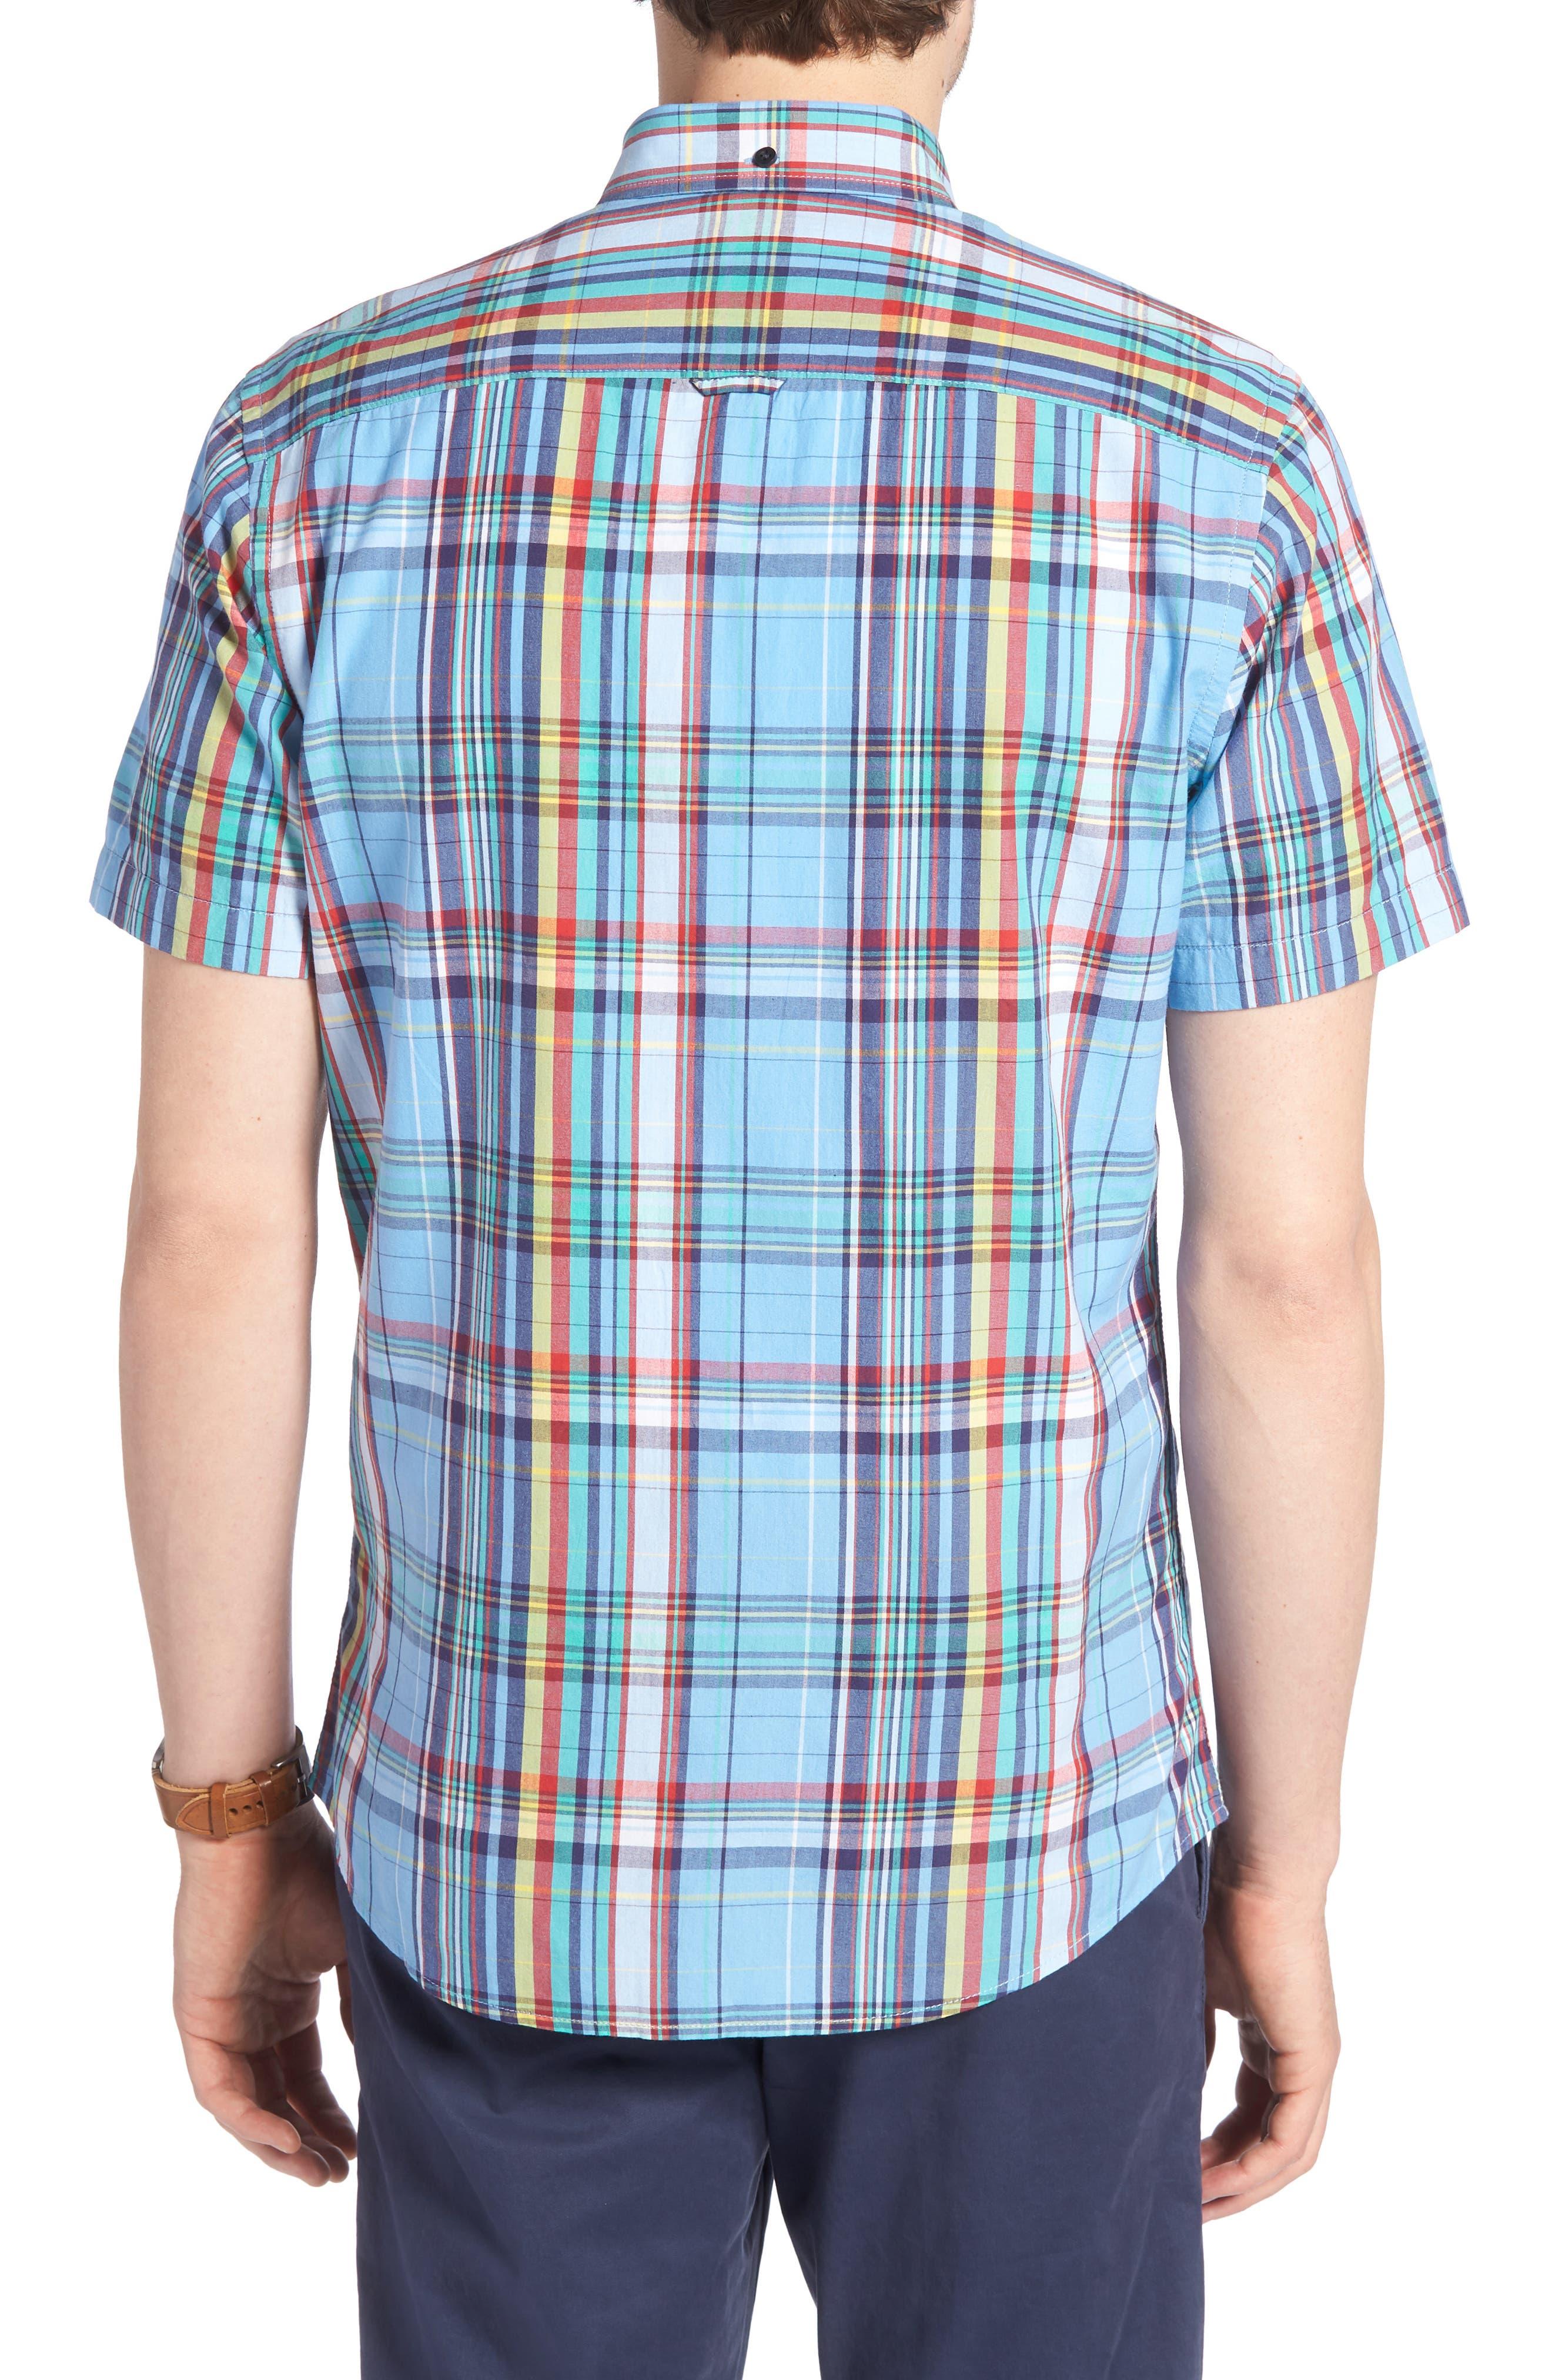 Ivy Trim Fit Madras Plaid Sport Shirt,                             Alternate thumbnail 3, color,                             Blue Chambray Multi Plaid